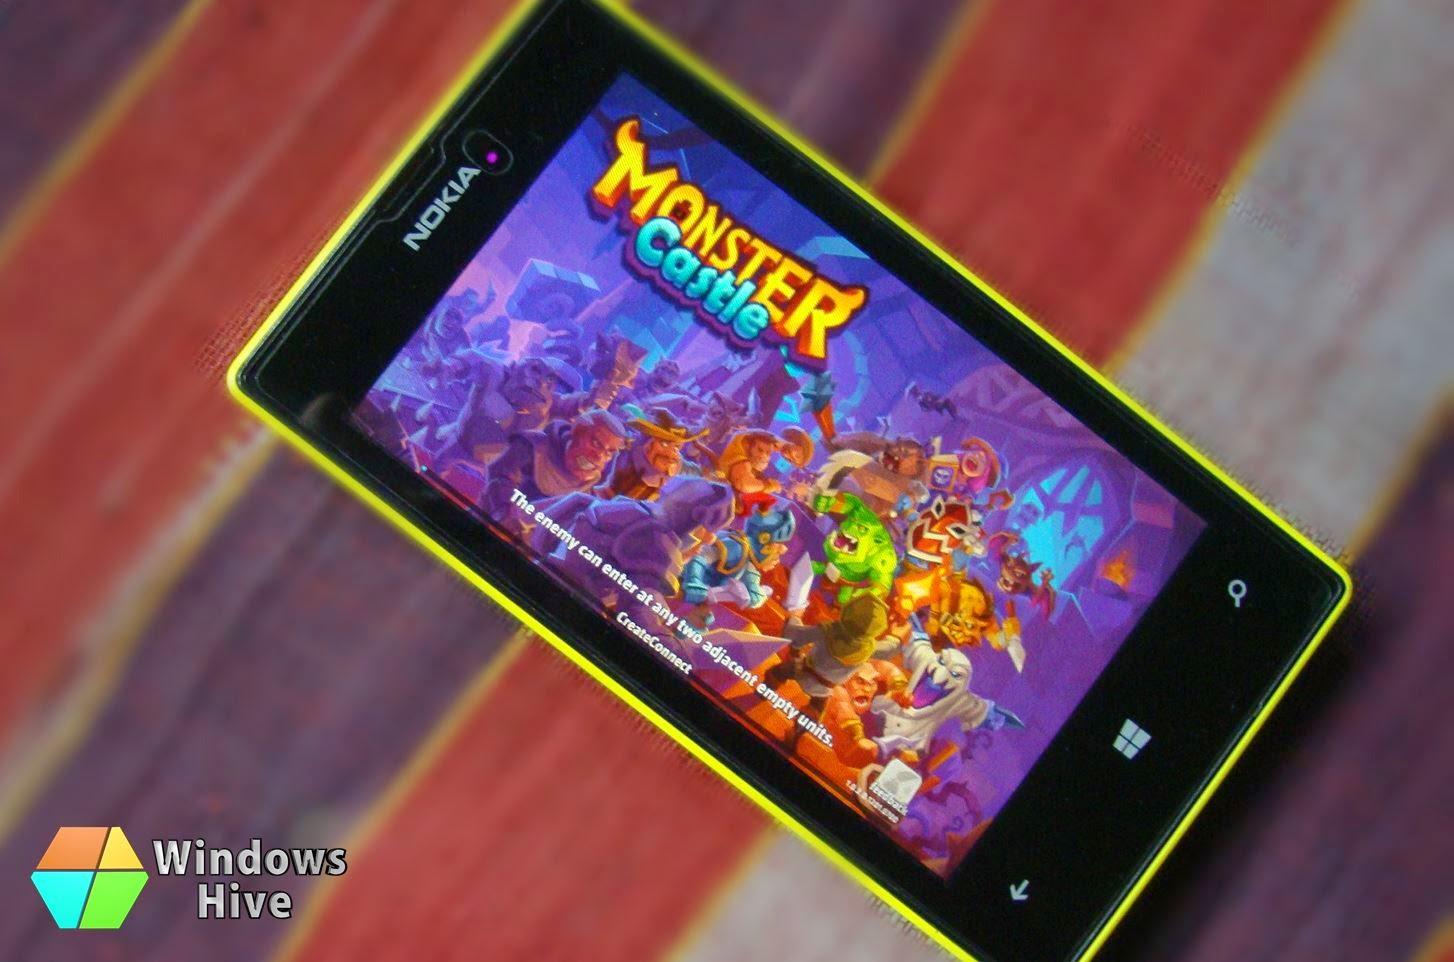 Monster castle on Windows Phone, games, apps